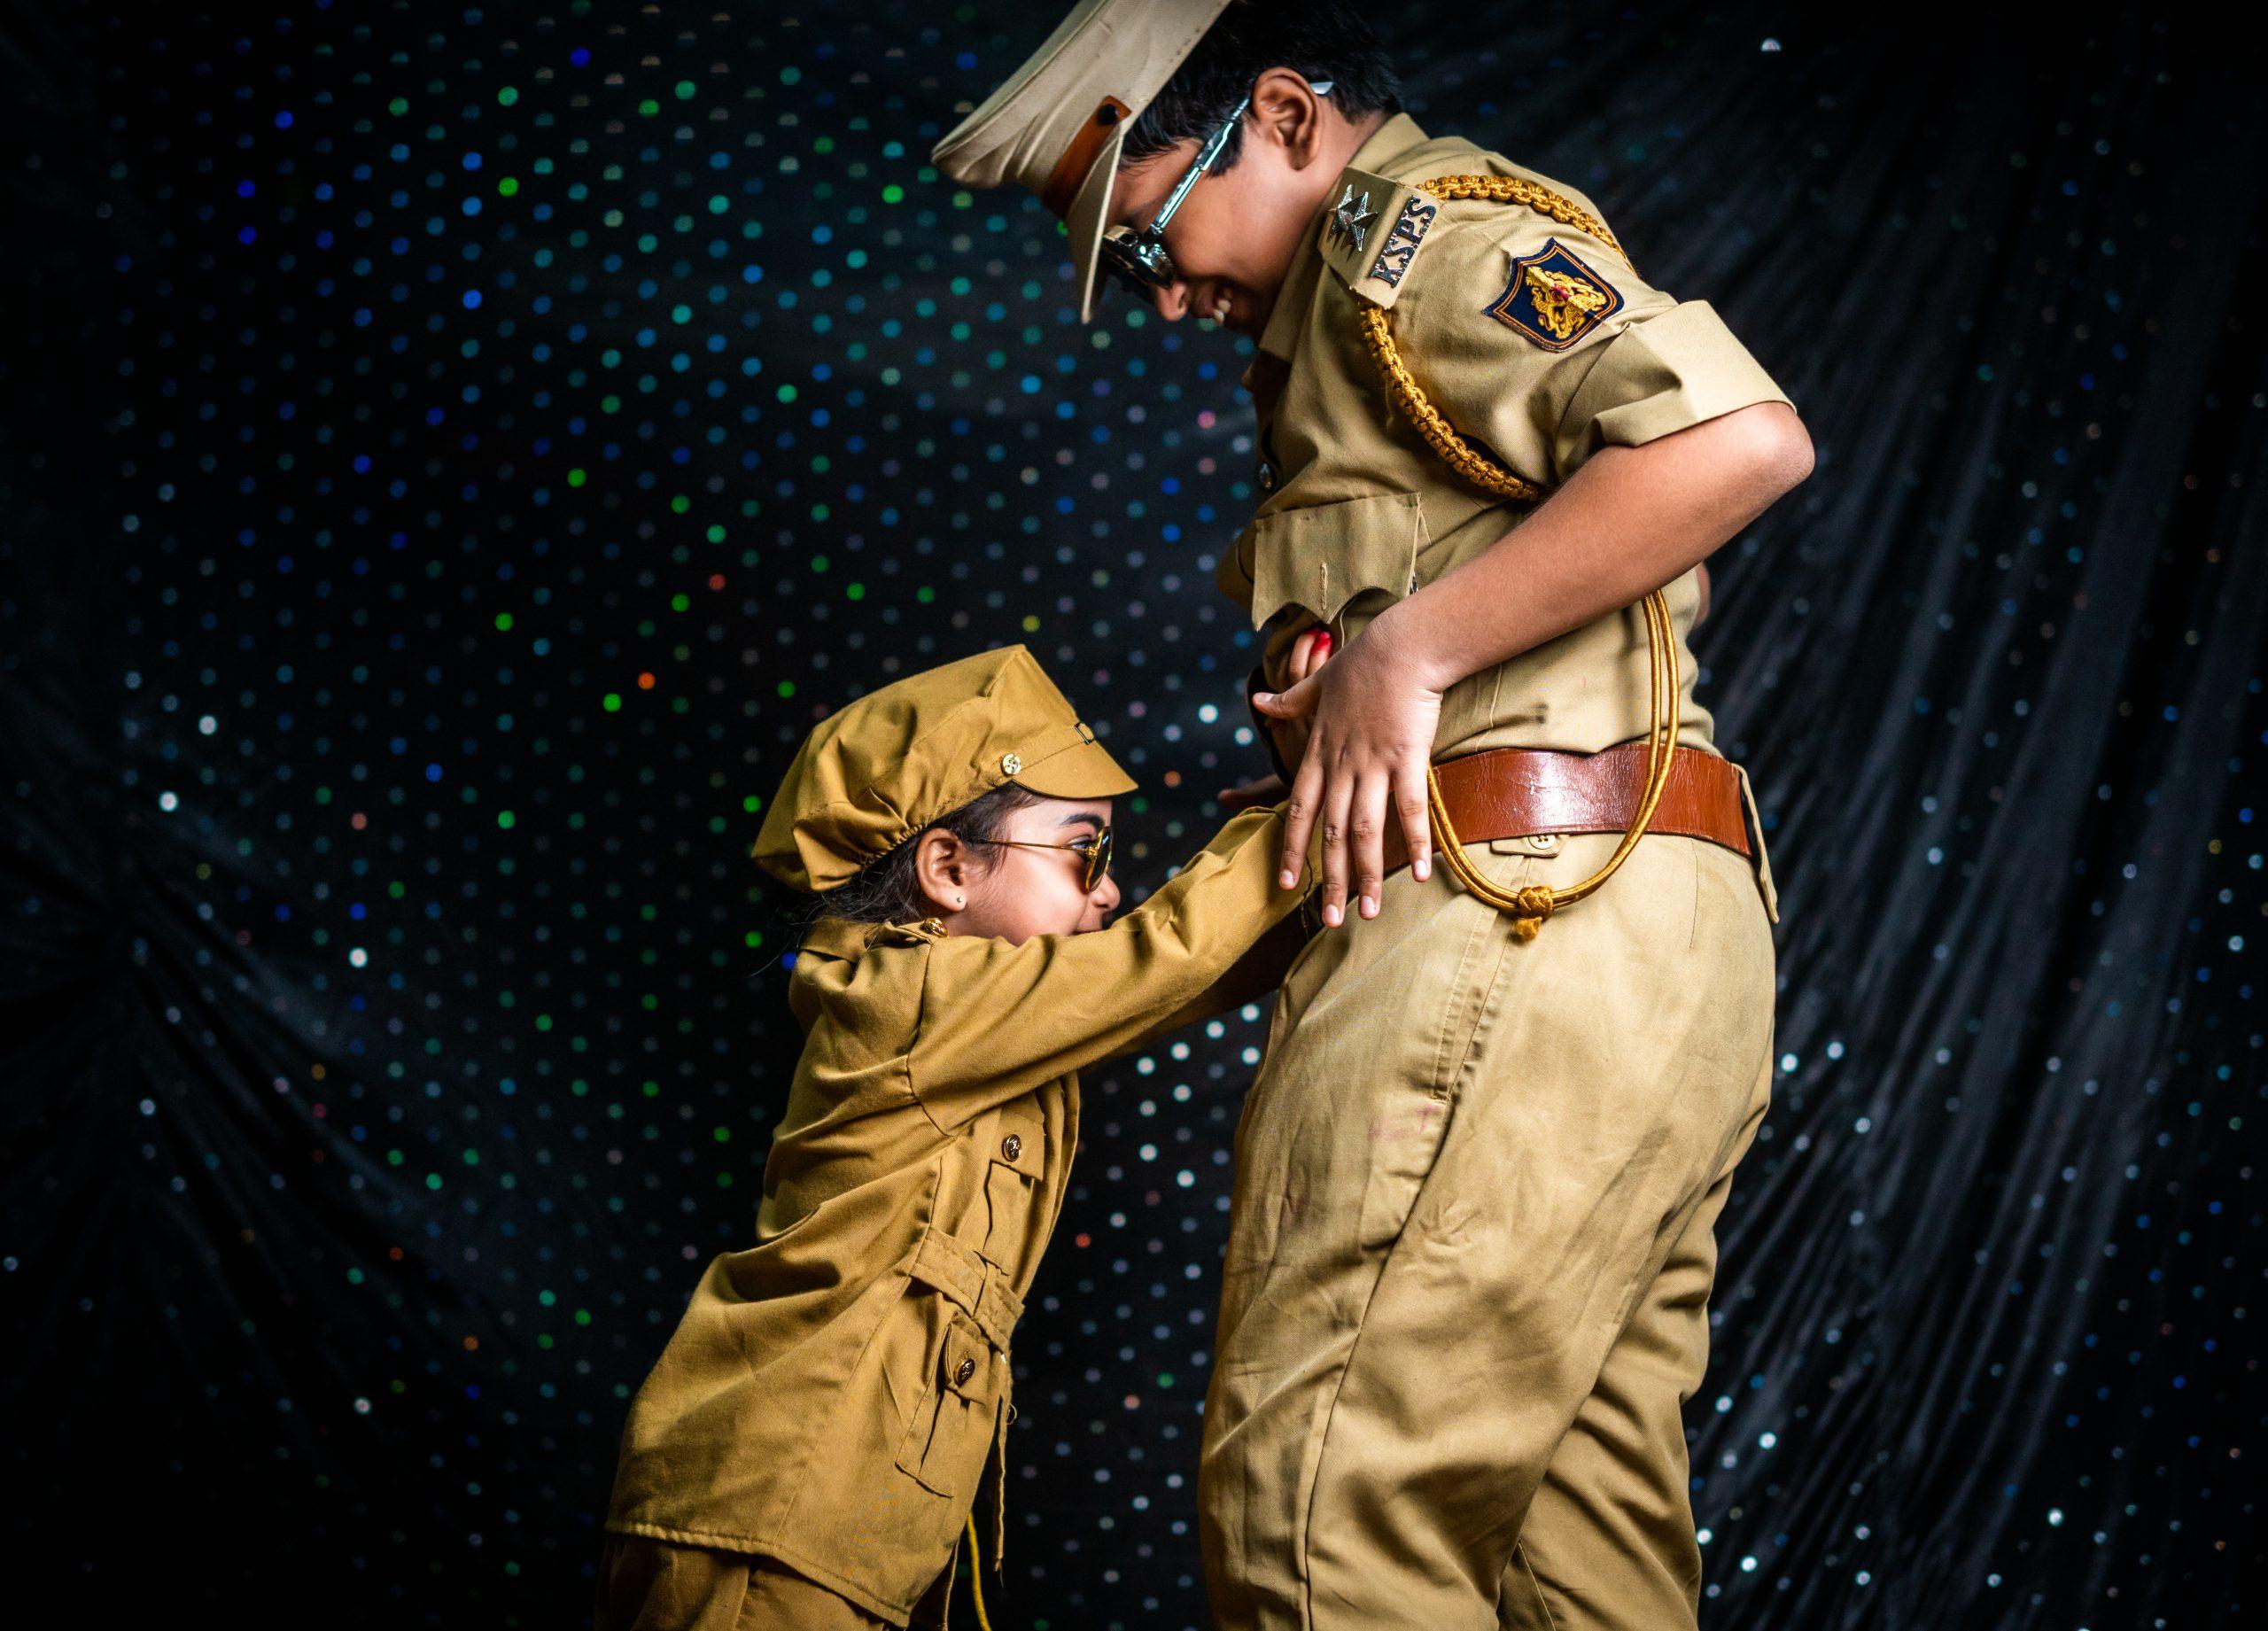 Kids in police getup